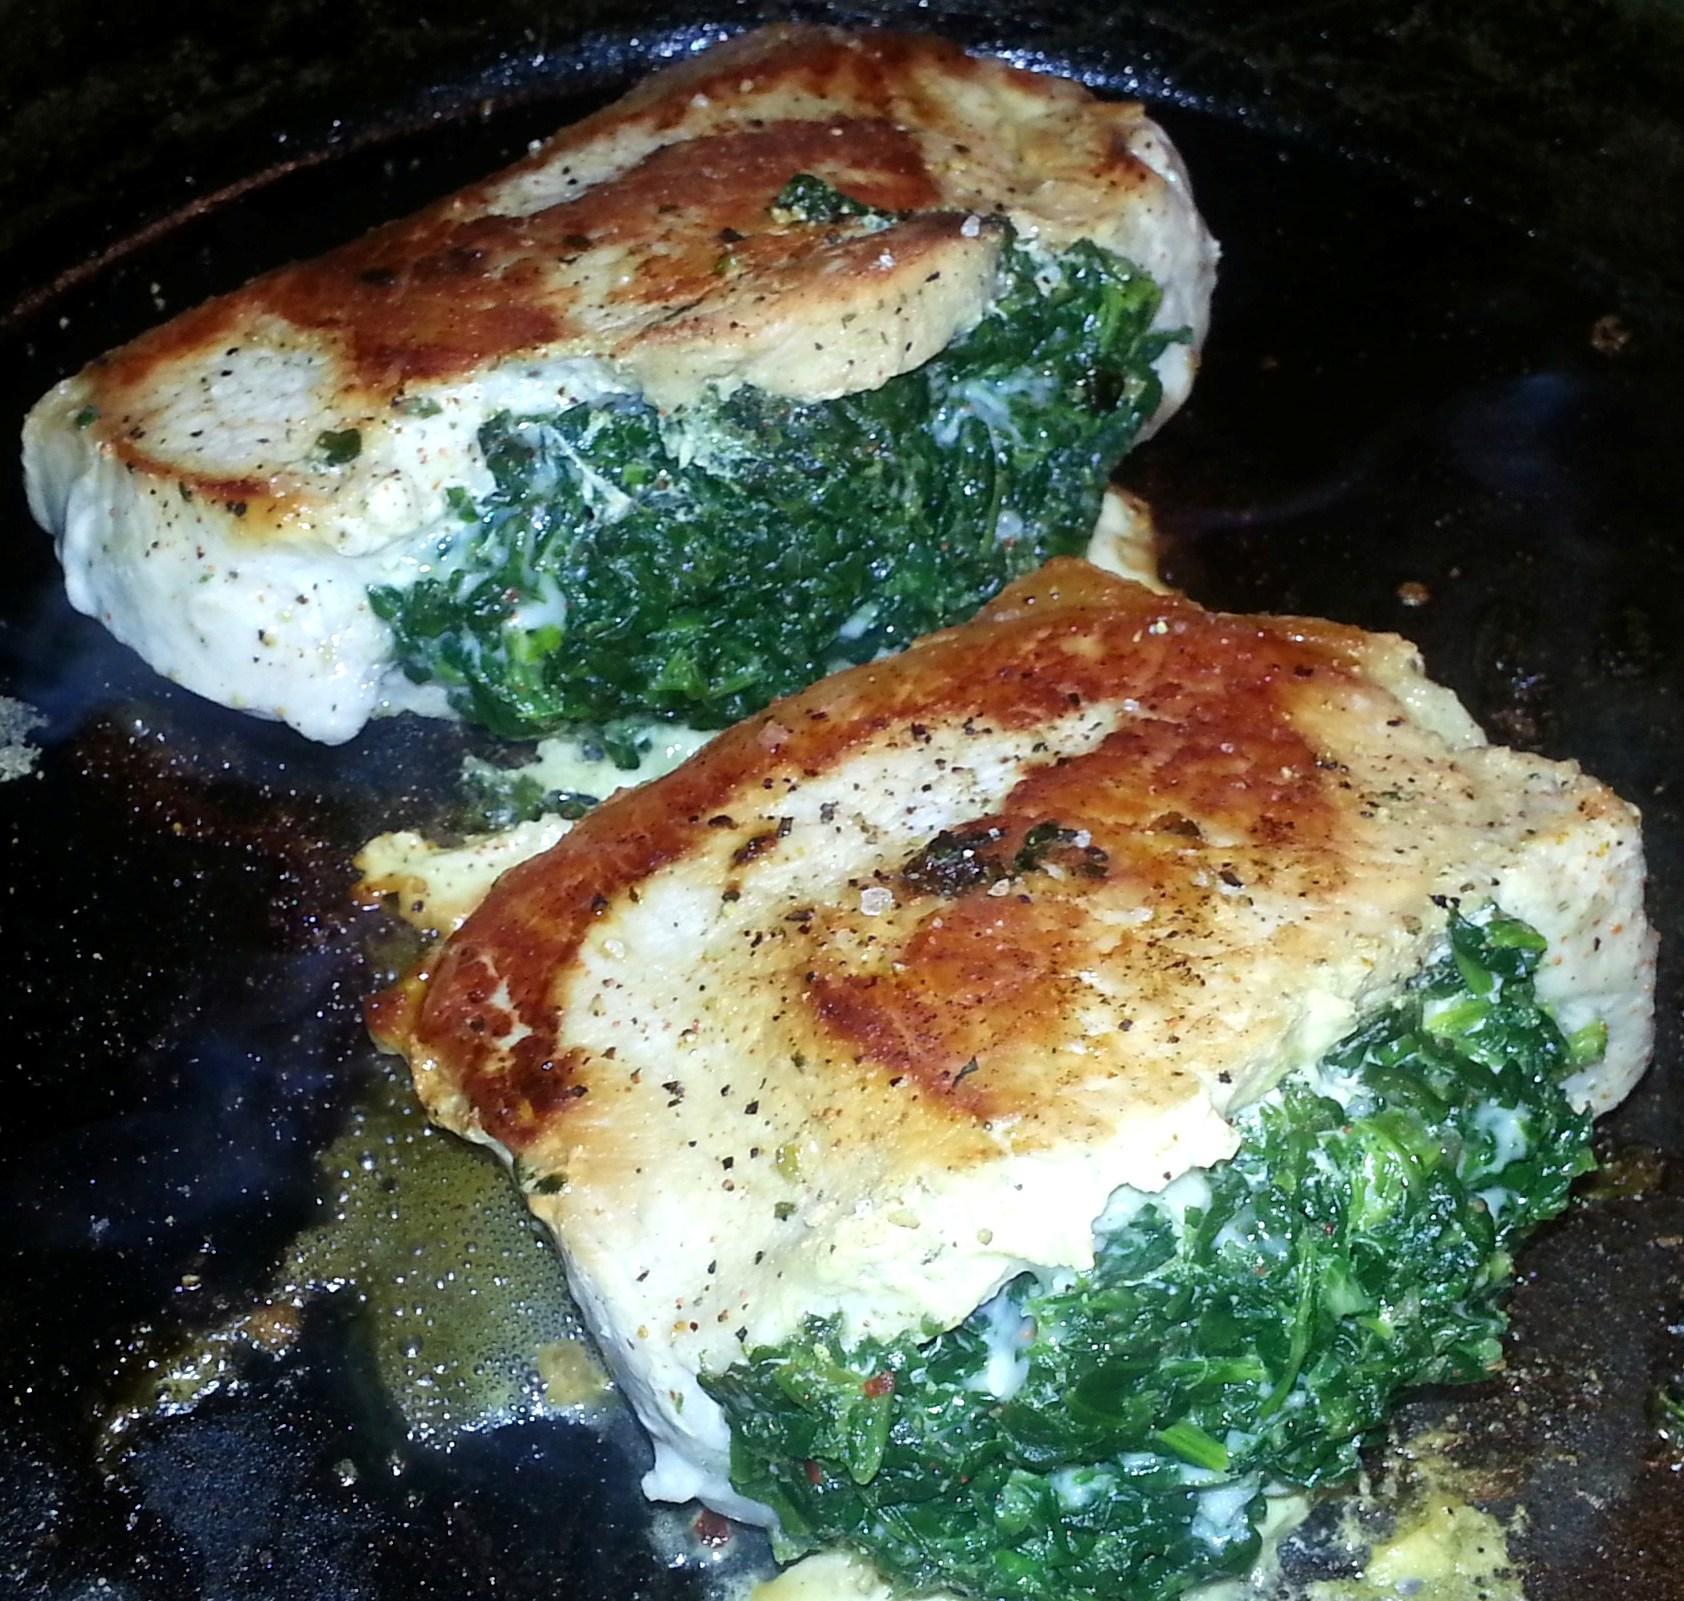 Spinach & Pepperjack Stuffed Pork Chops | Sore Legs & Scrambled Eggs